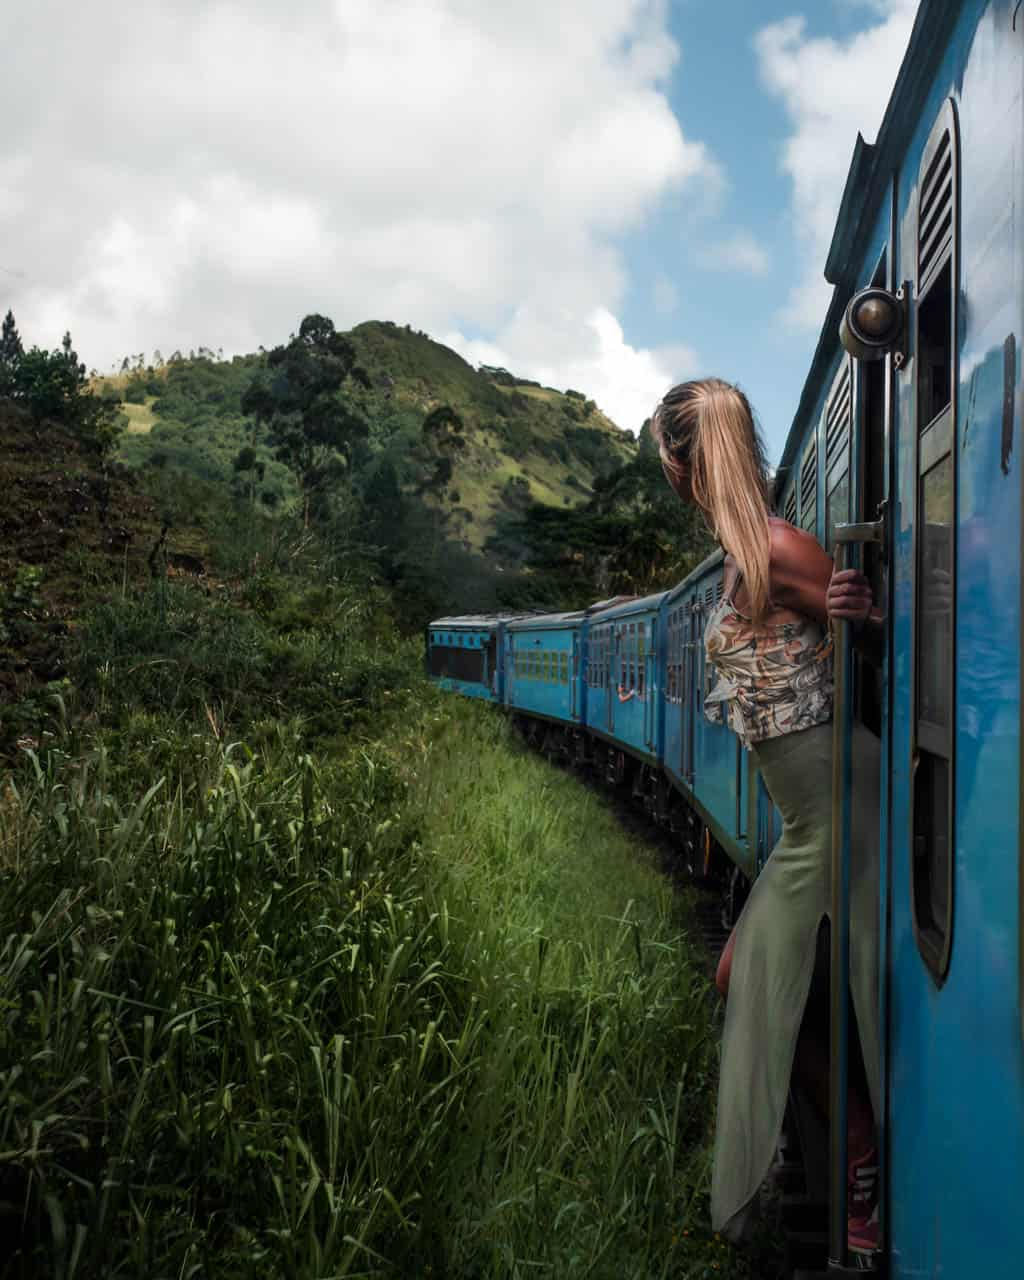 kandy-train